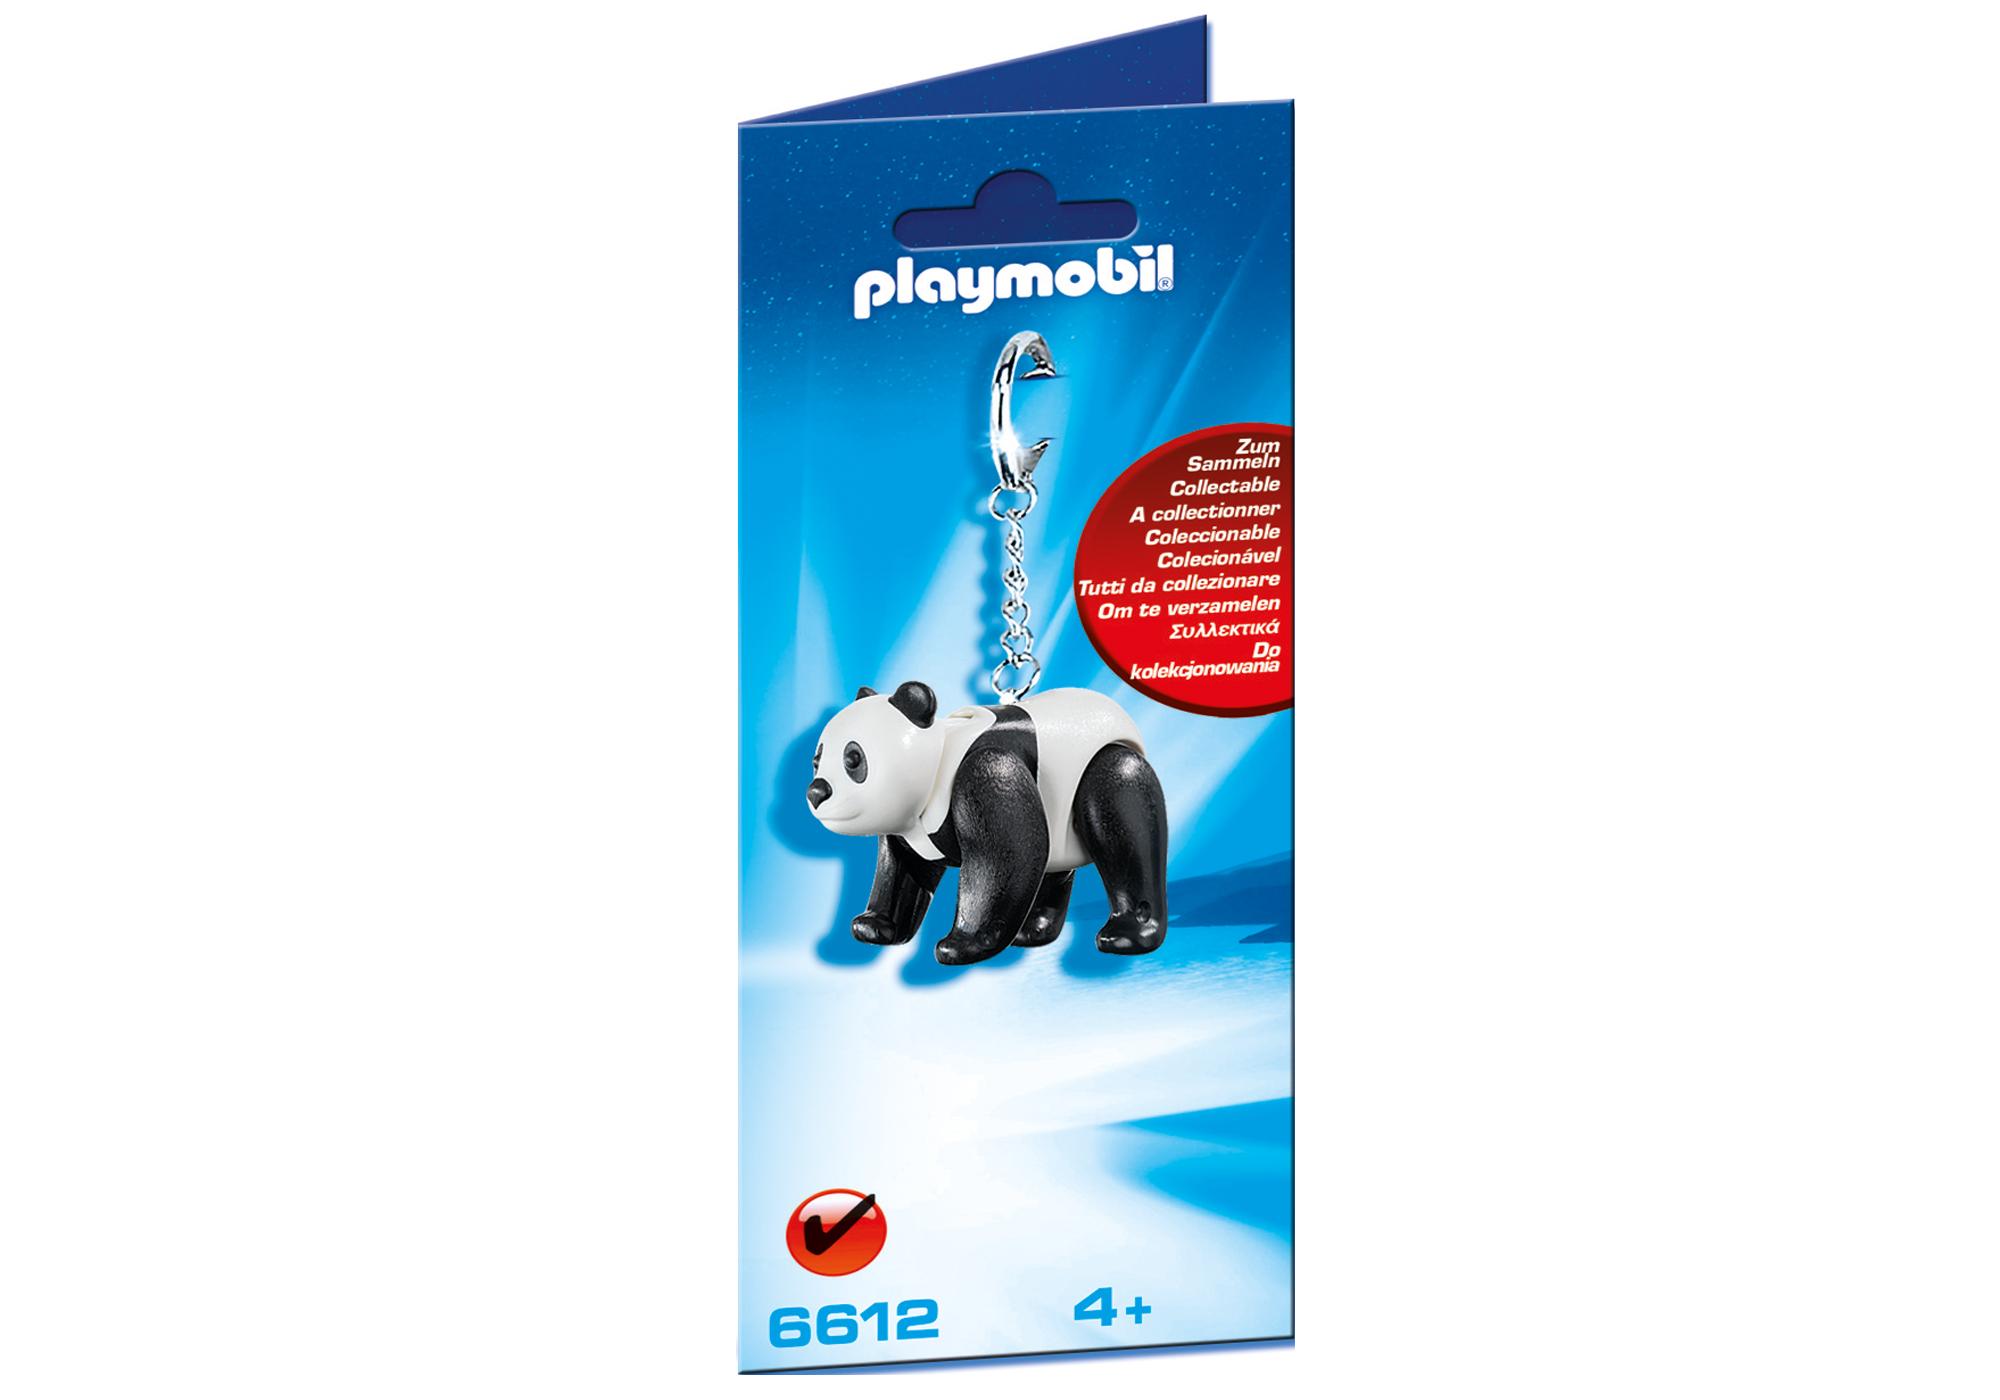 http://media.playmobil.com/i/playmobil/6612_product_box_front